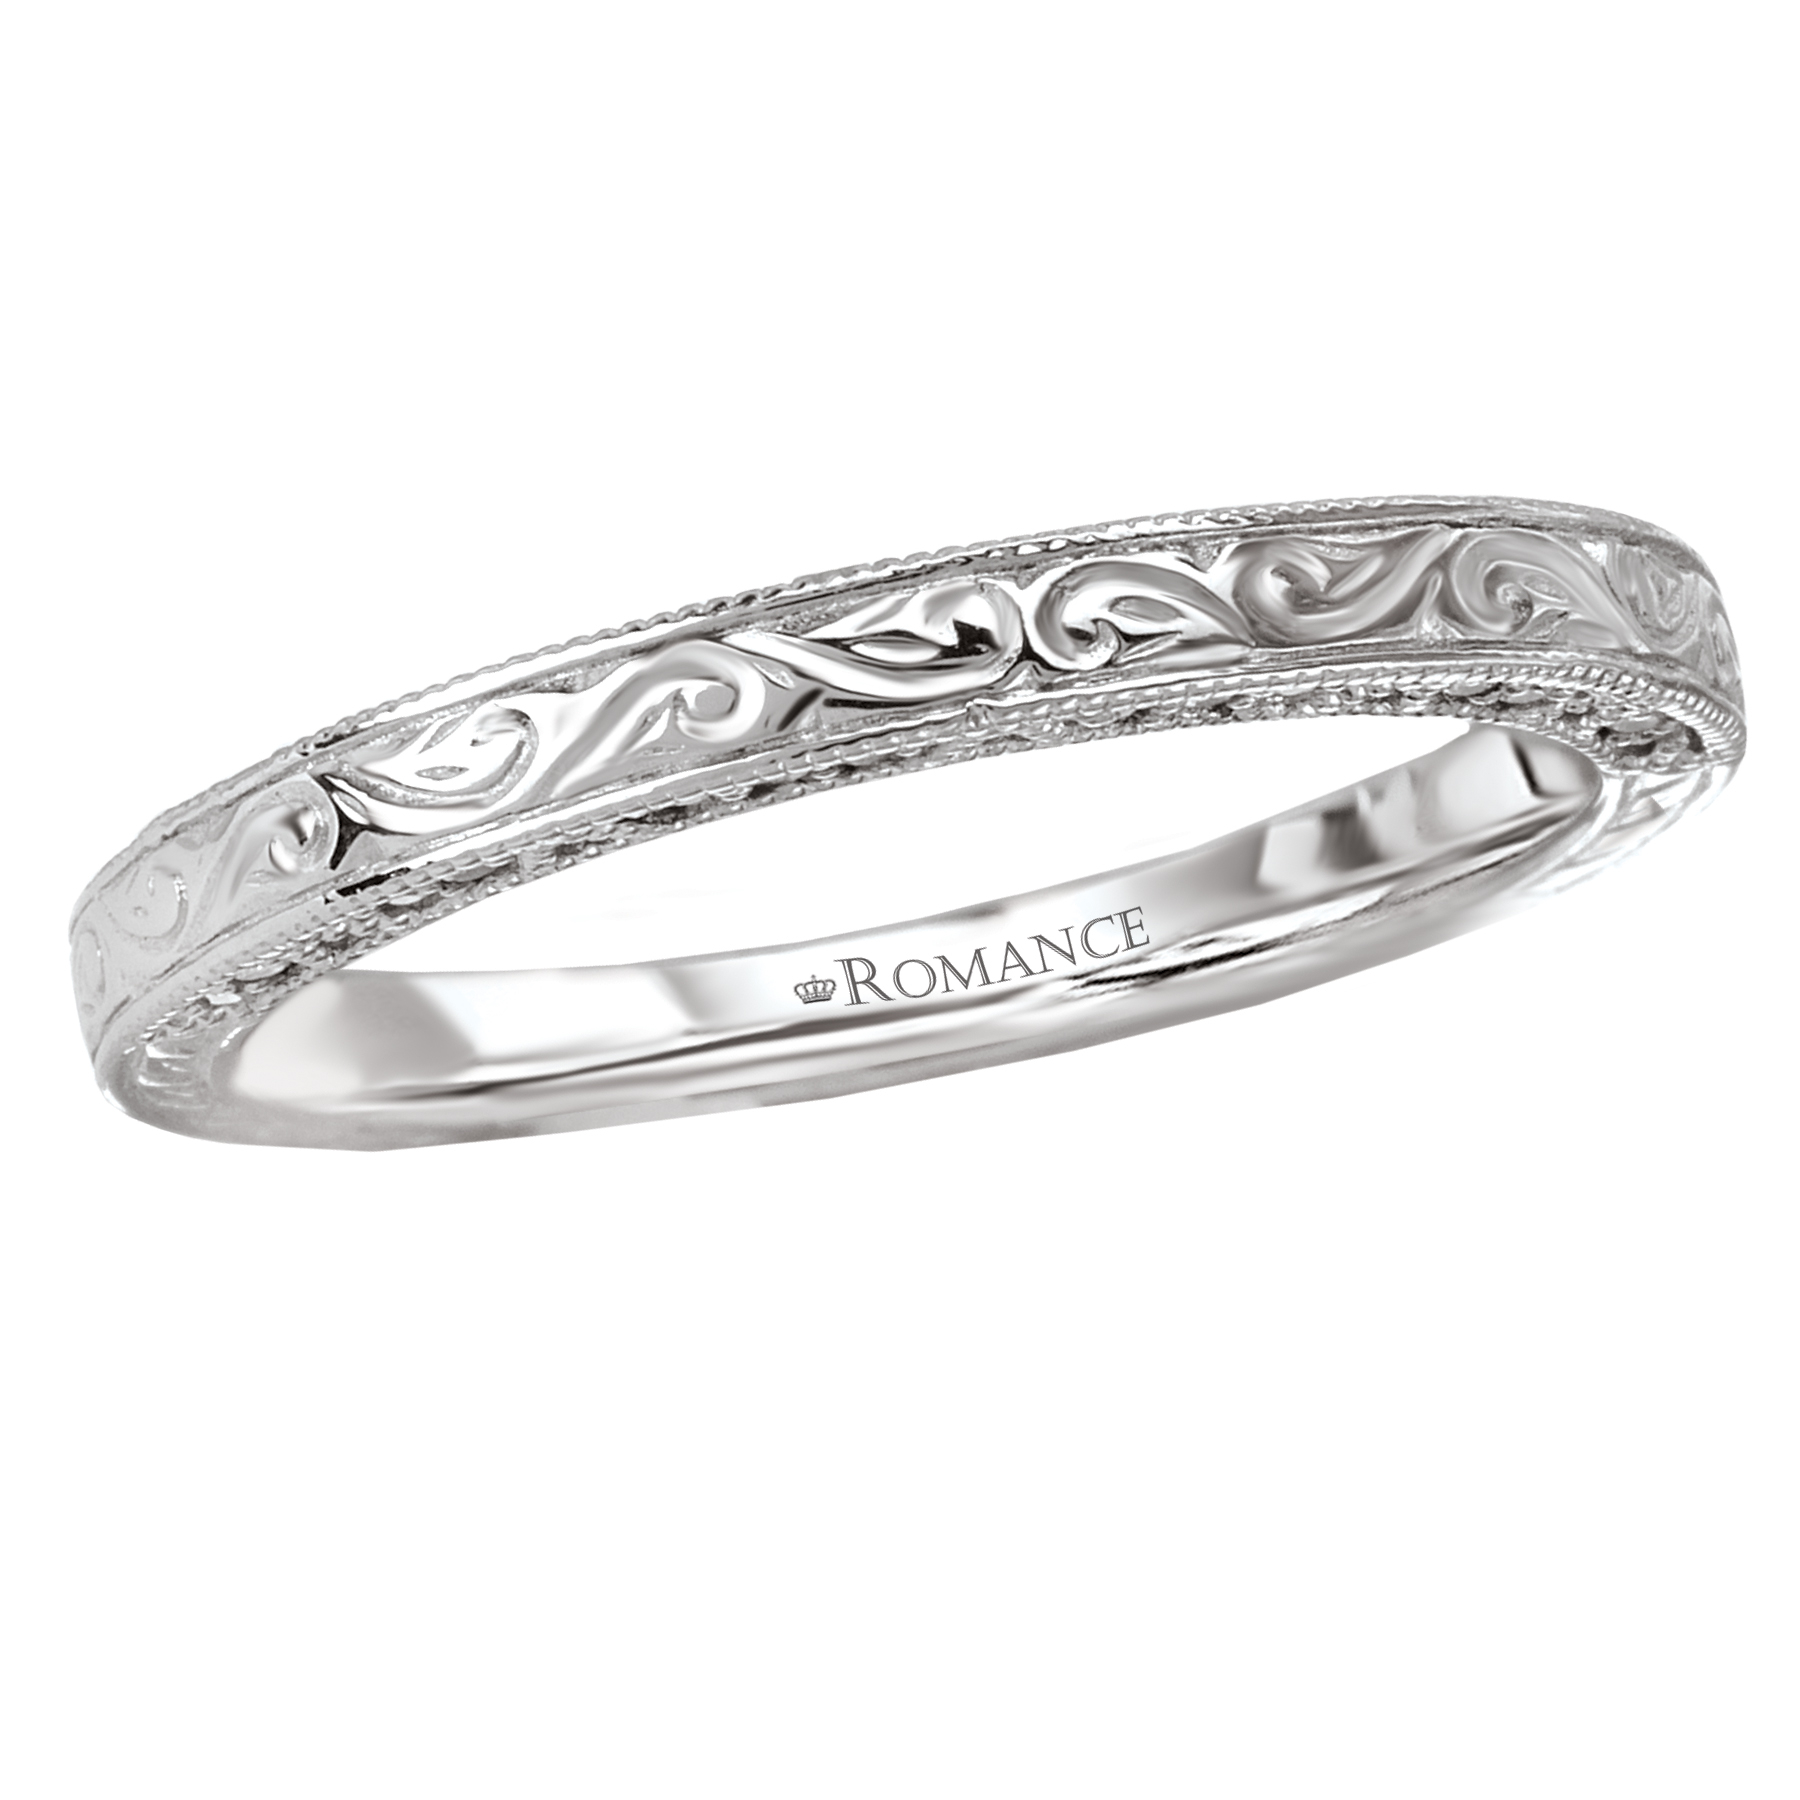 Romantic Bands: Romance Wedding Bands 117534-W